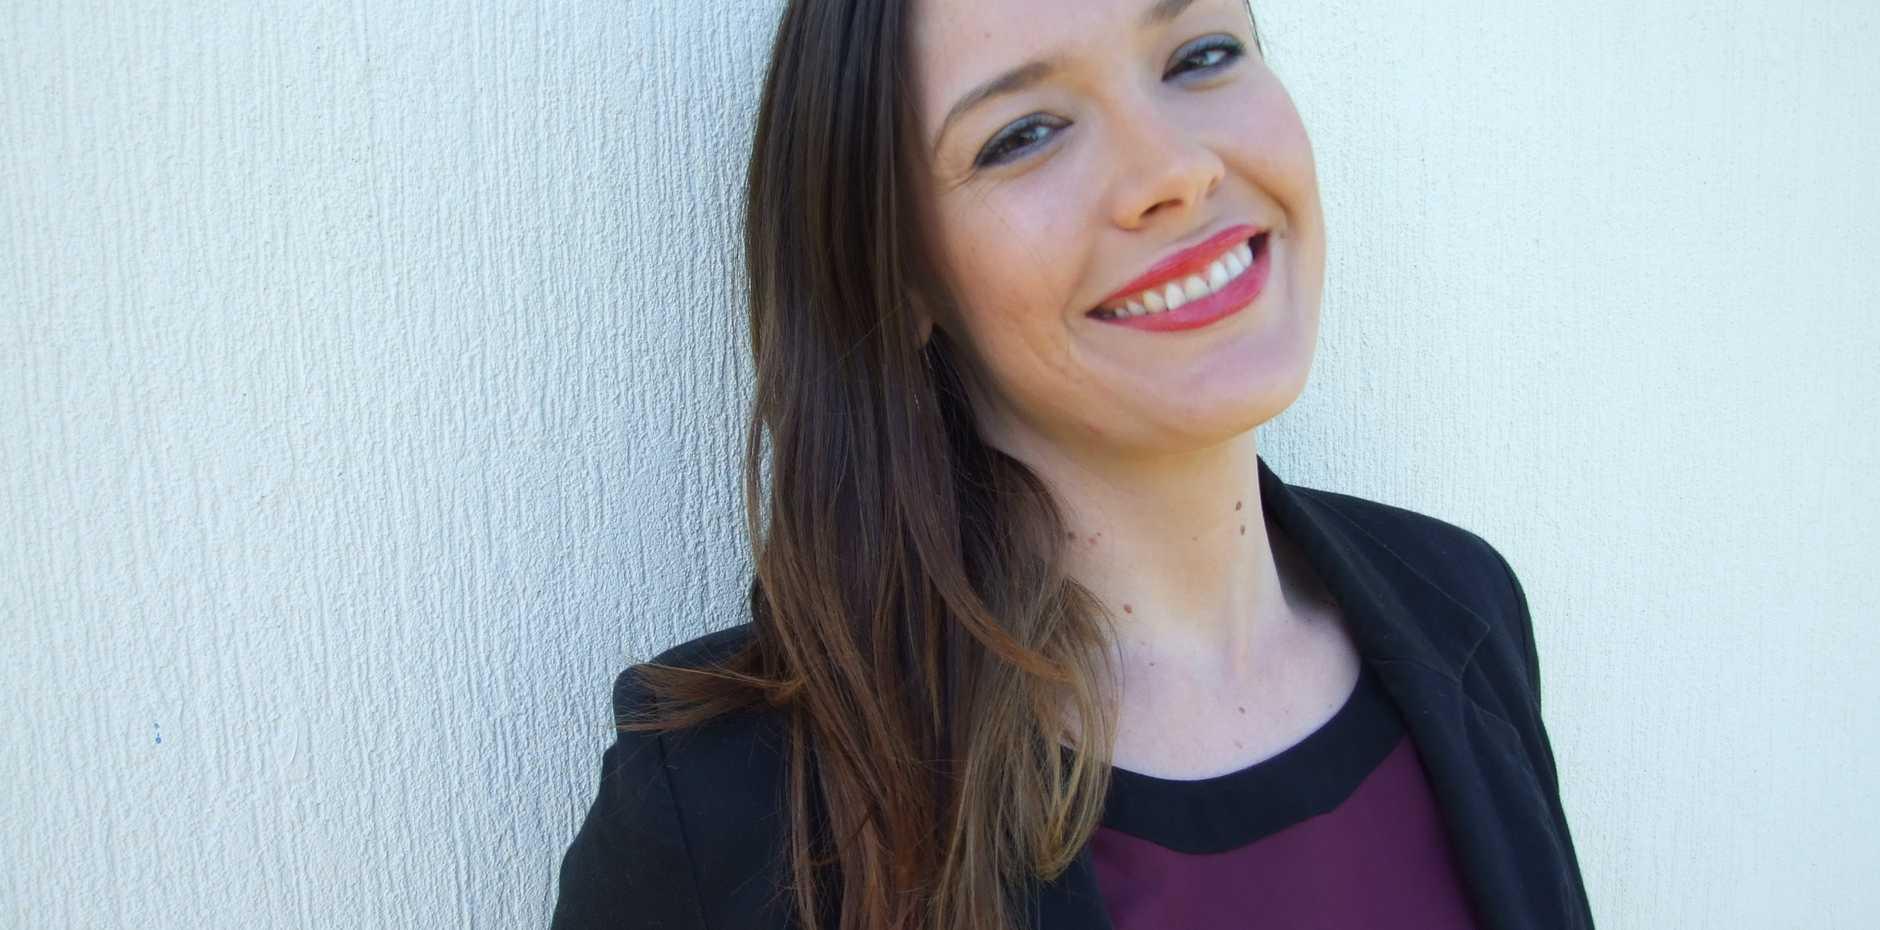 Cara Brett is a Senior Financial Adviser for Bounce Financial